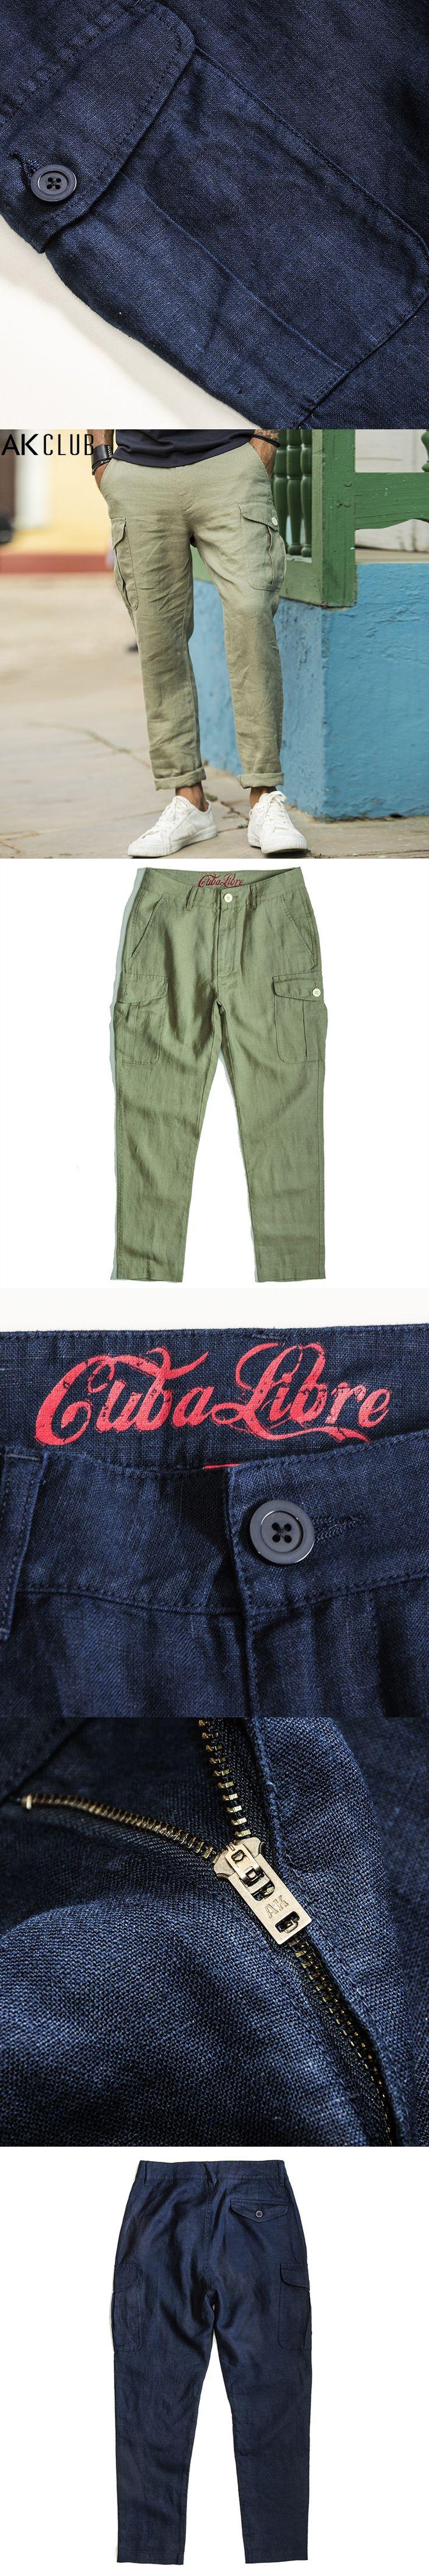 AK CLUB Men Linen Pants Cuba Libre Series New Pocket Harem Pants Jogger Legging Casual Pants Full Length Men Pants Baggy 1712033